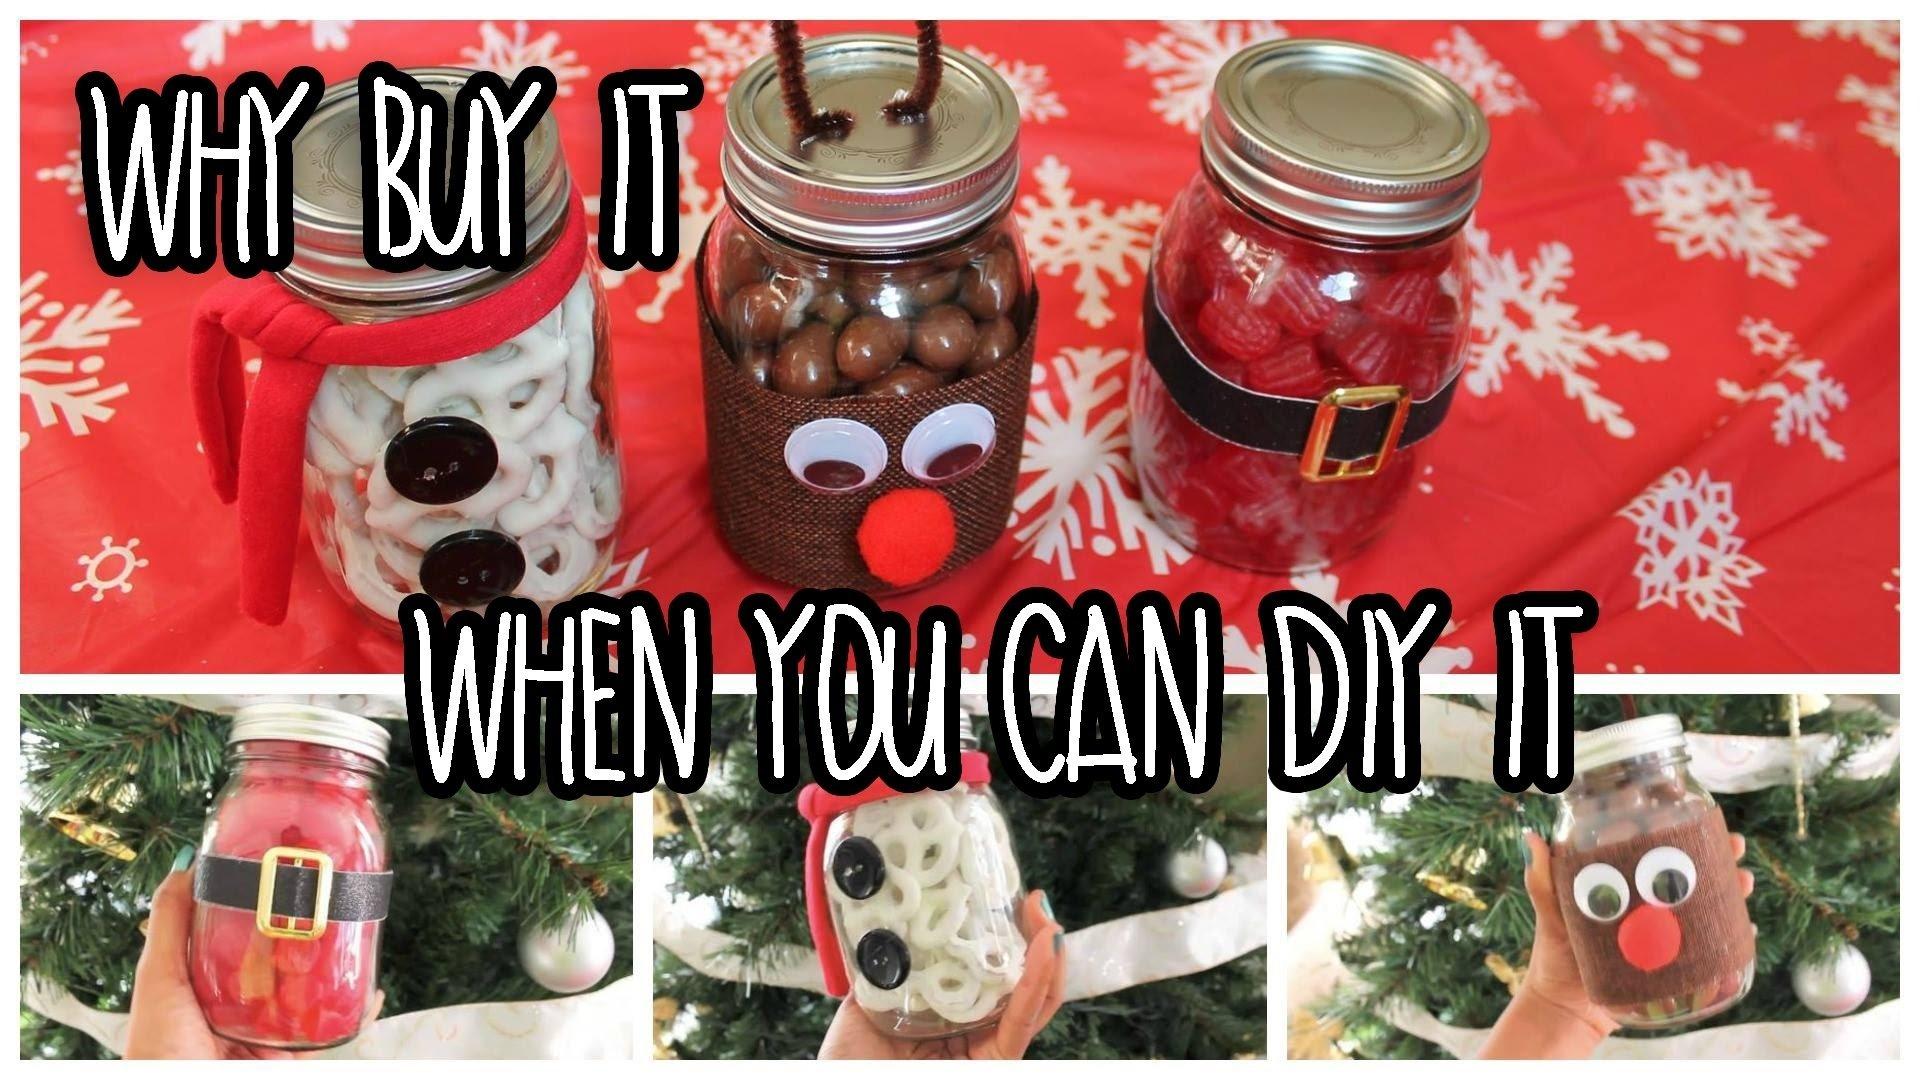 10 Cute Last Minute Homemade Christmas Gift Ideas